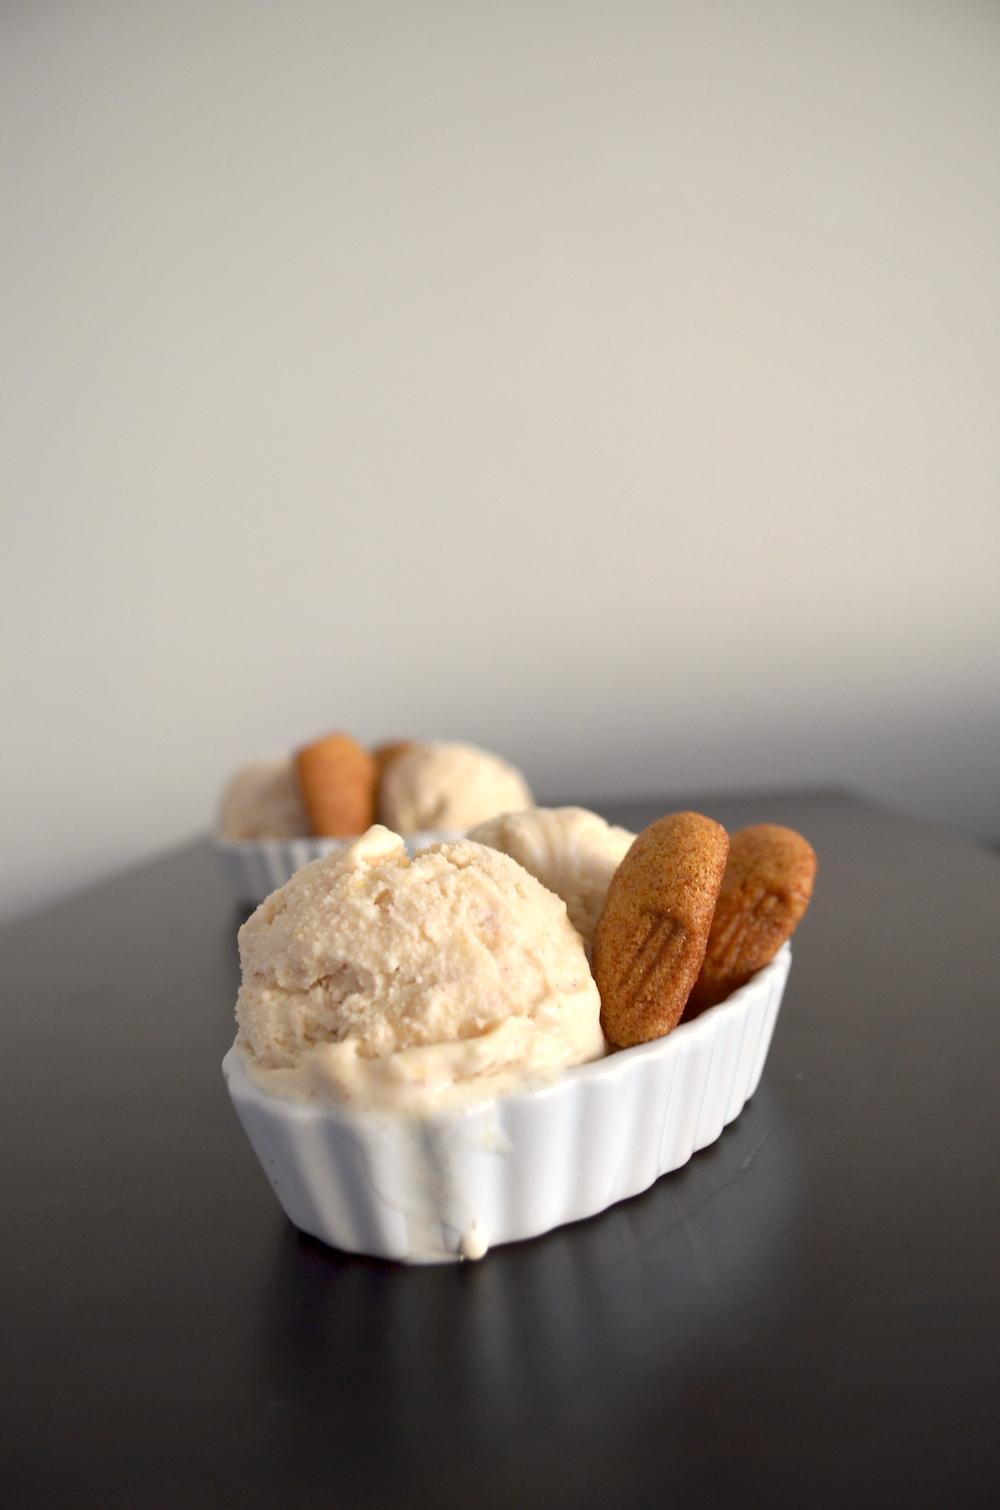 Peach pie ice cream with snickerdoodles | www.paperplatesblog.com